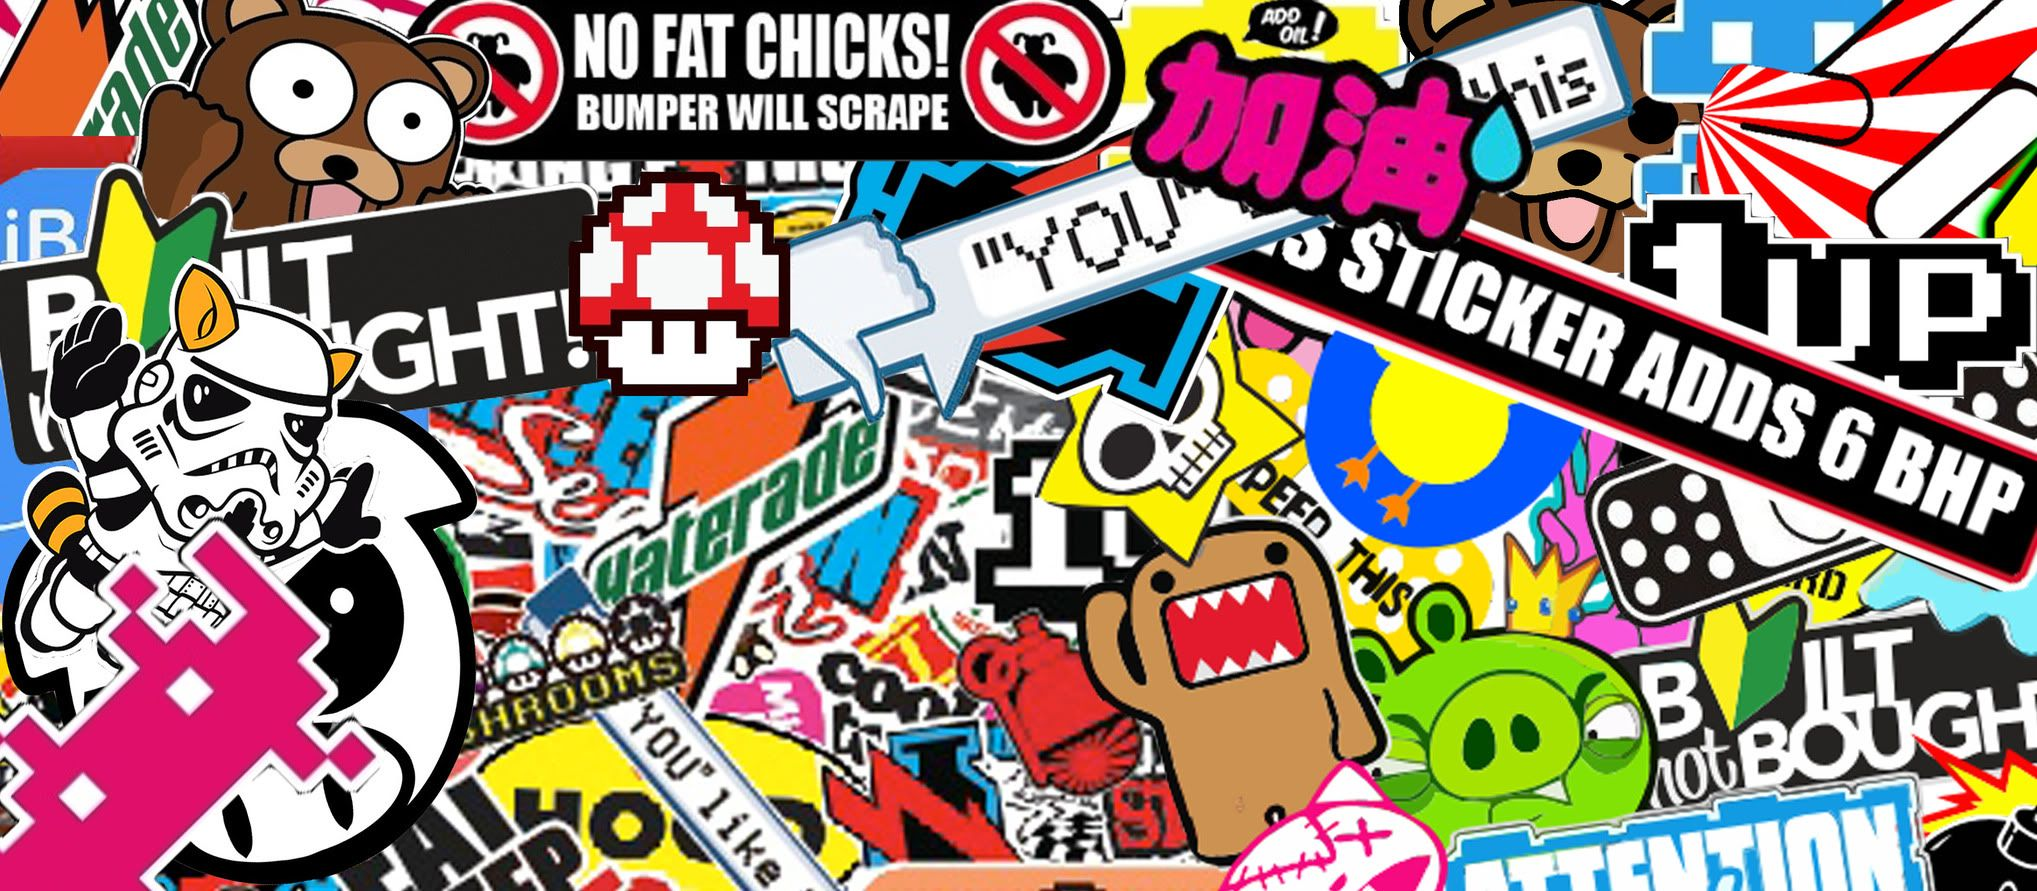 Sticker bomb car design - Sticker Bombing Google